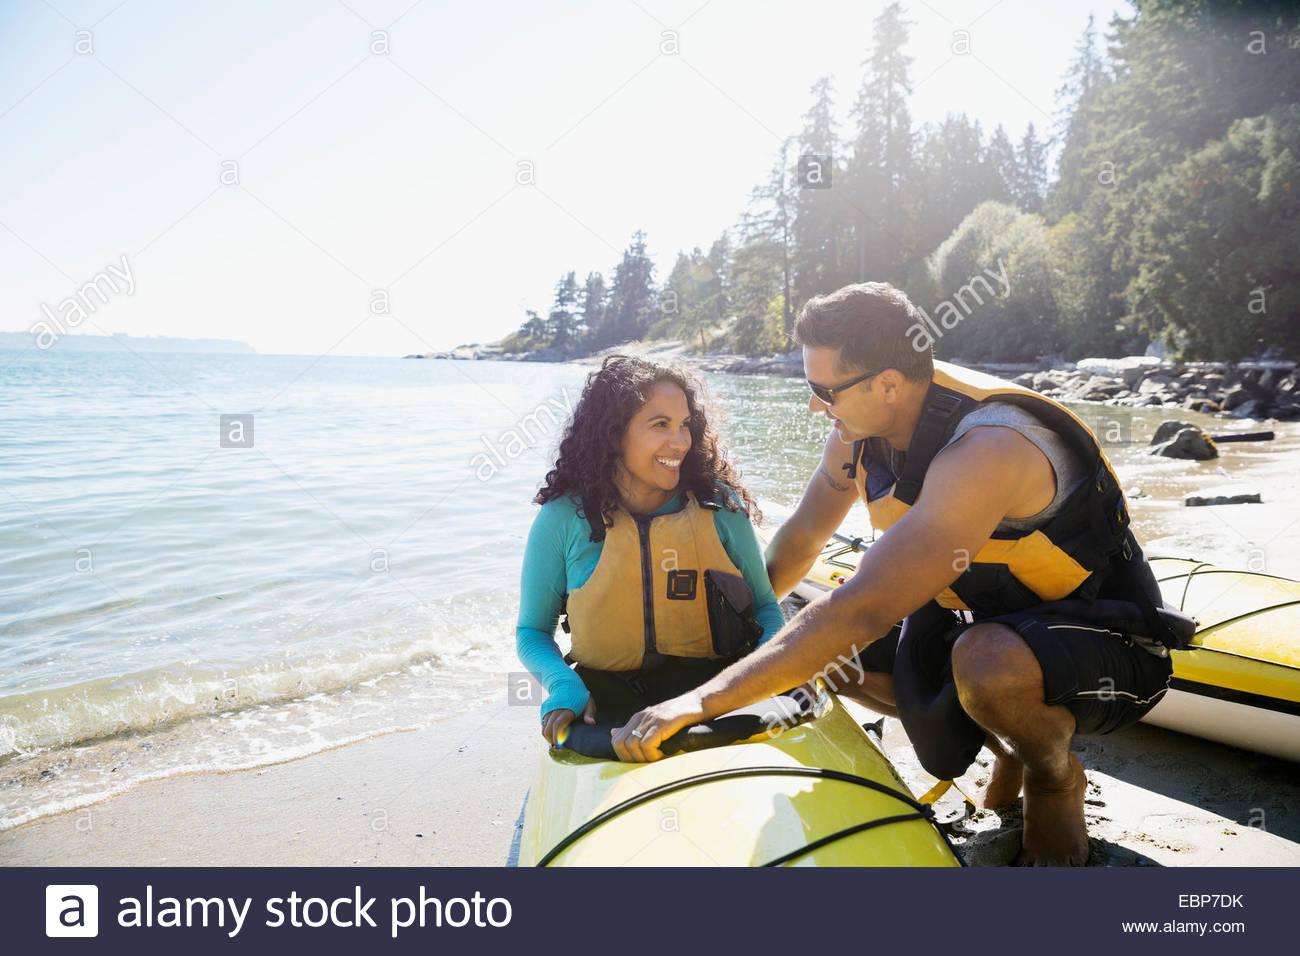 Couple preparing kayaks on sunny beach - Stock Image